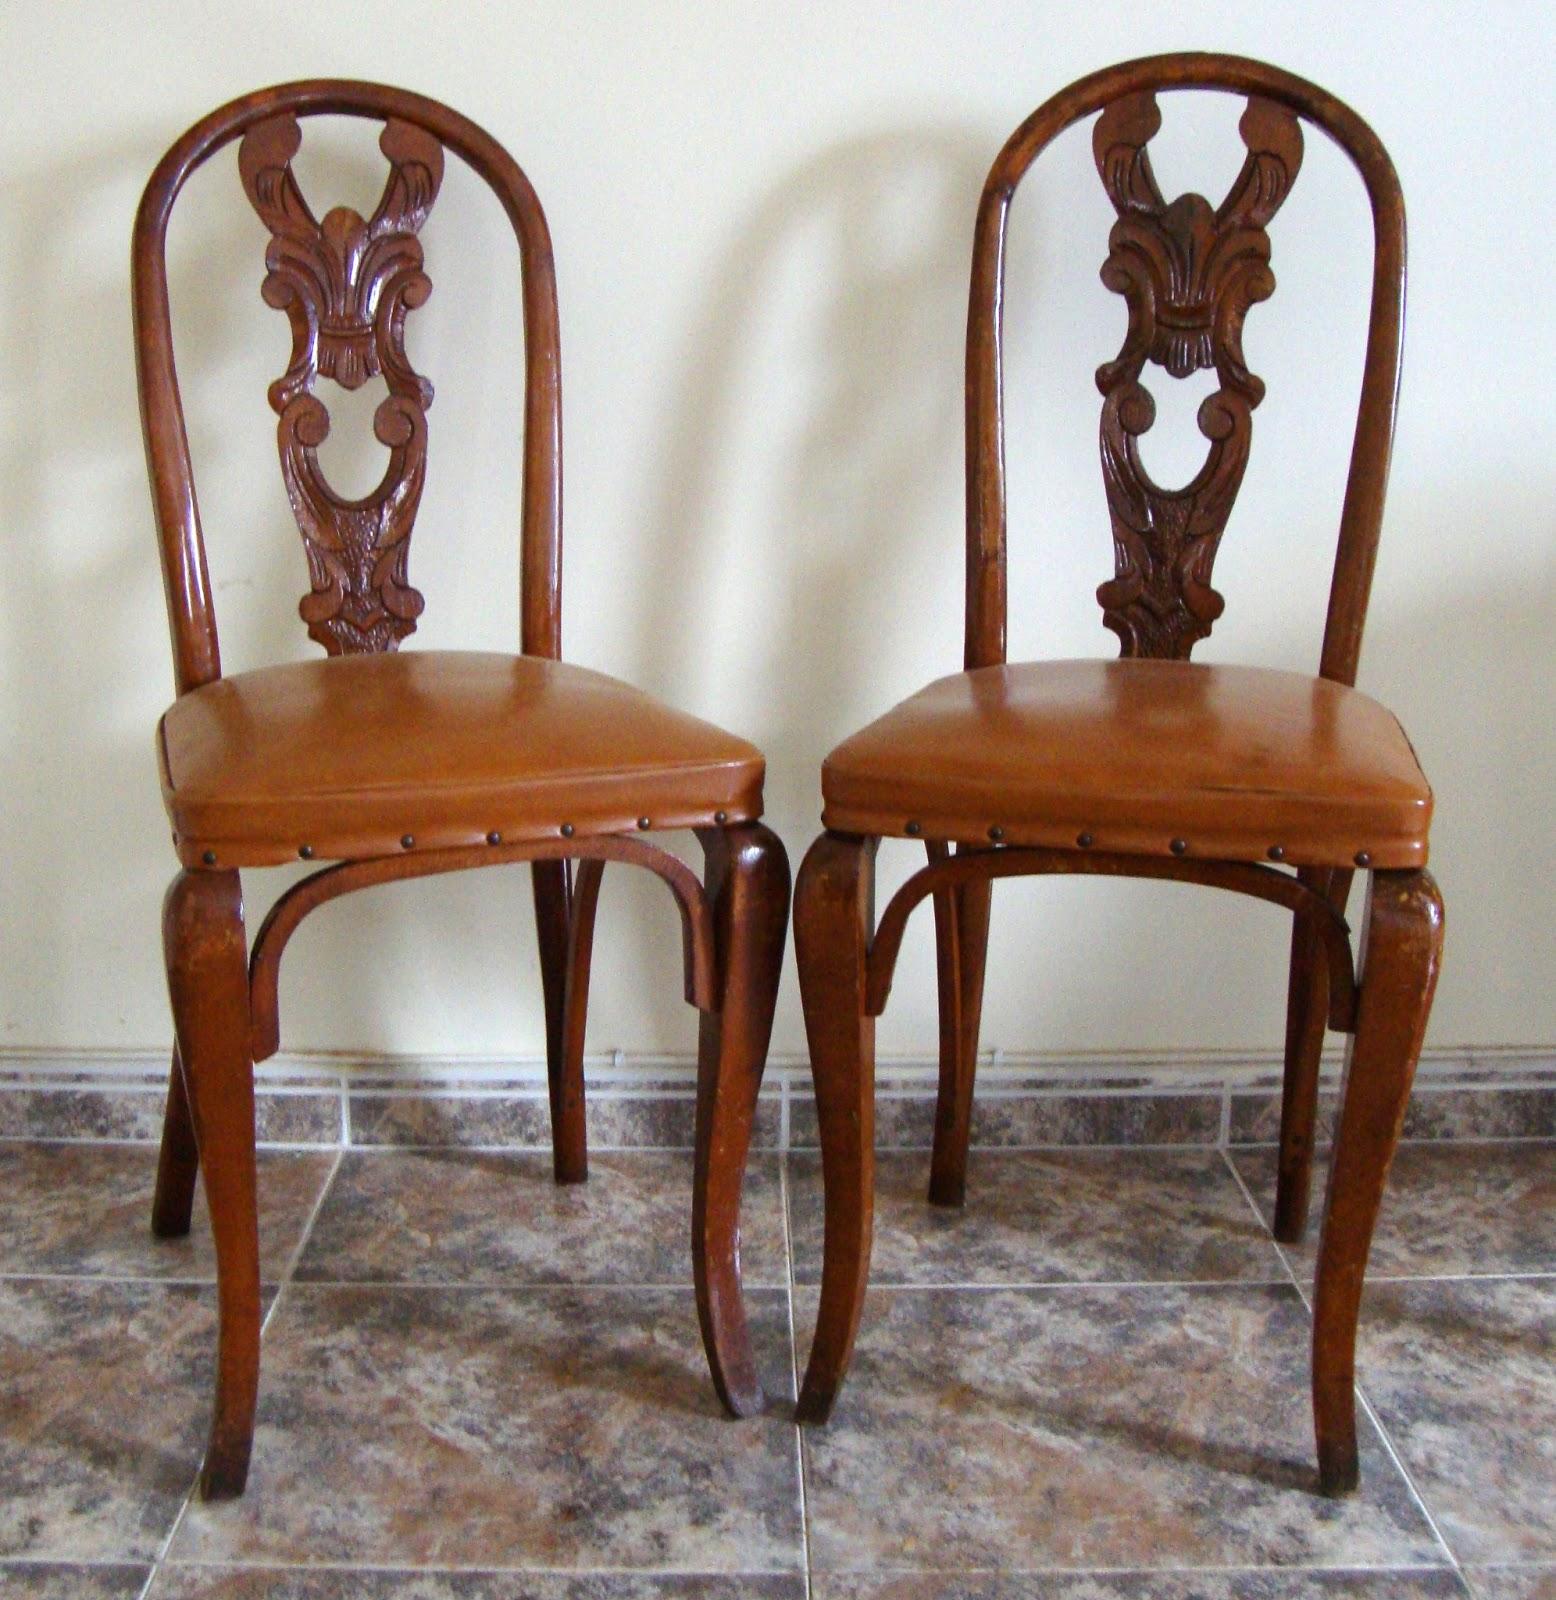 Renovarte muebles sillas tapizadas - Sillas provenzal tapizadas ...